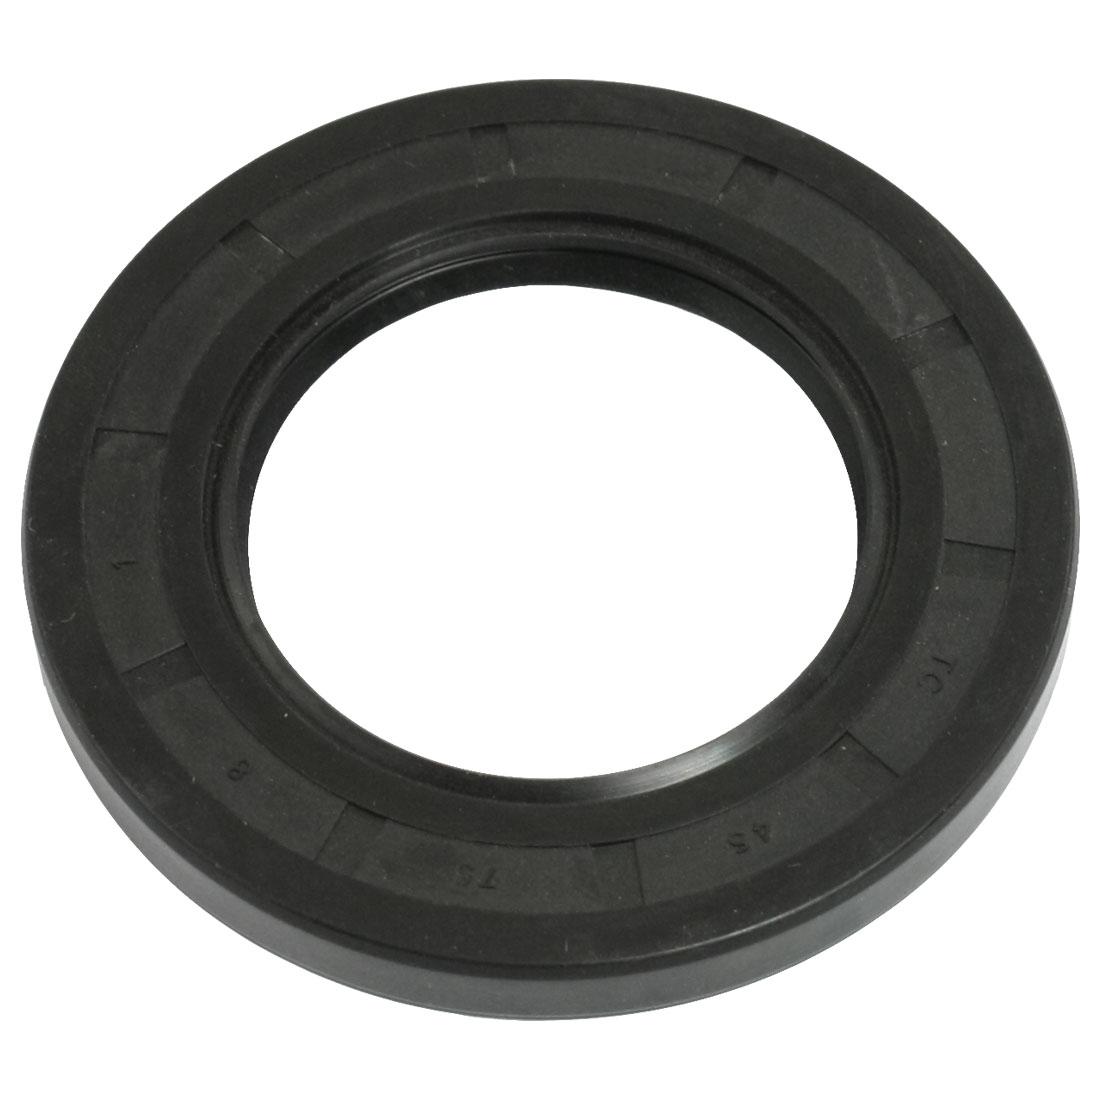 Black NBR Steel Spring Double Lip TC Oil Shaft Seal 45mm x 75mm x 8mm